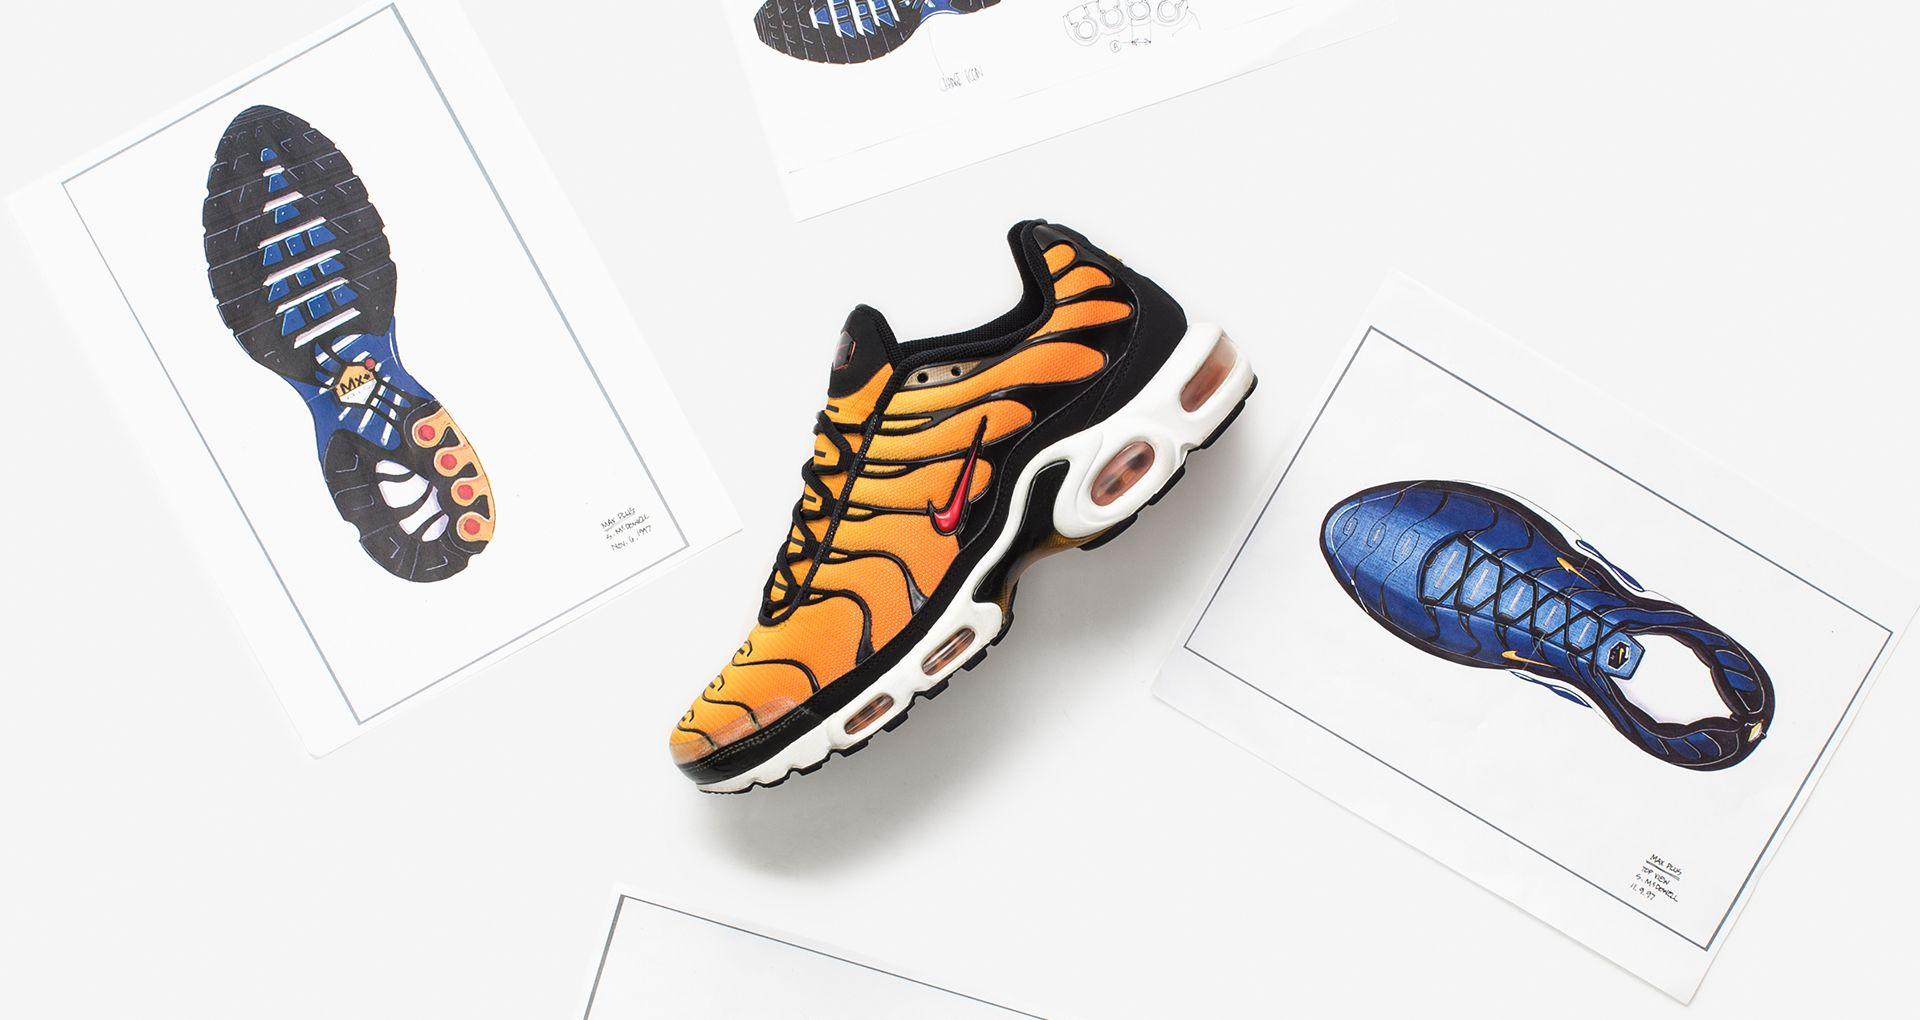 f6e3e8d691 Behind The Design: Nike Air Vapormax Plus. Nike+ SNKRS